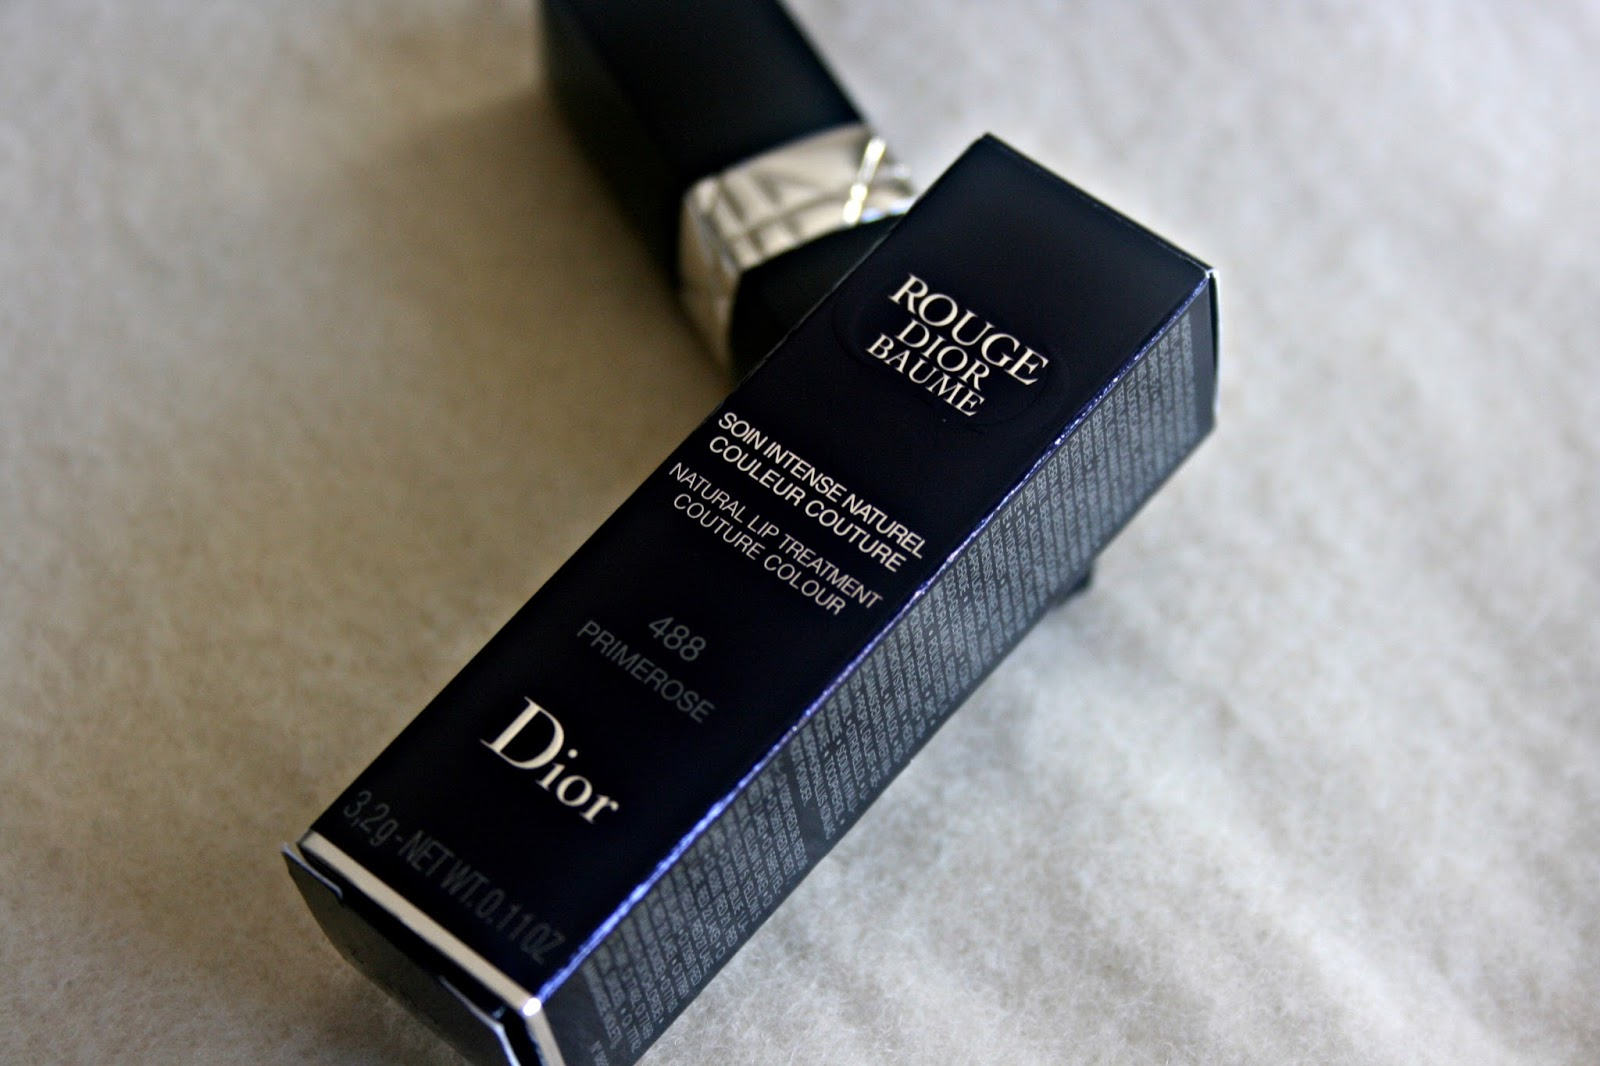 Dior Rouge Dior Baume in 488 Primerose